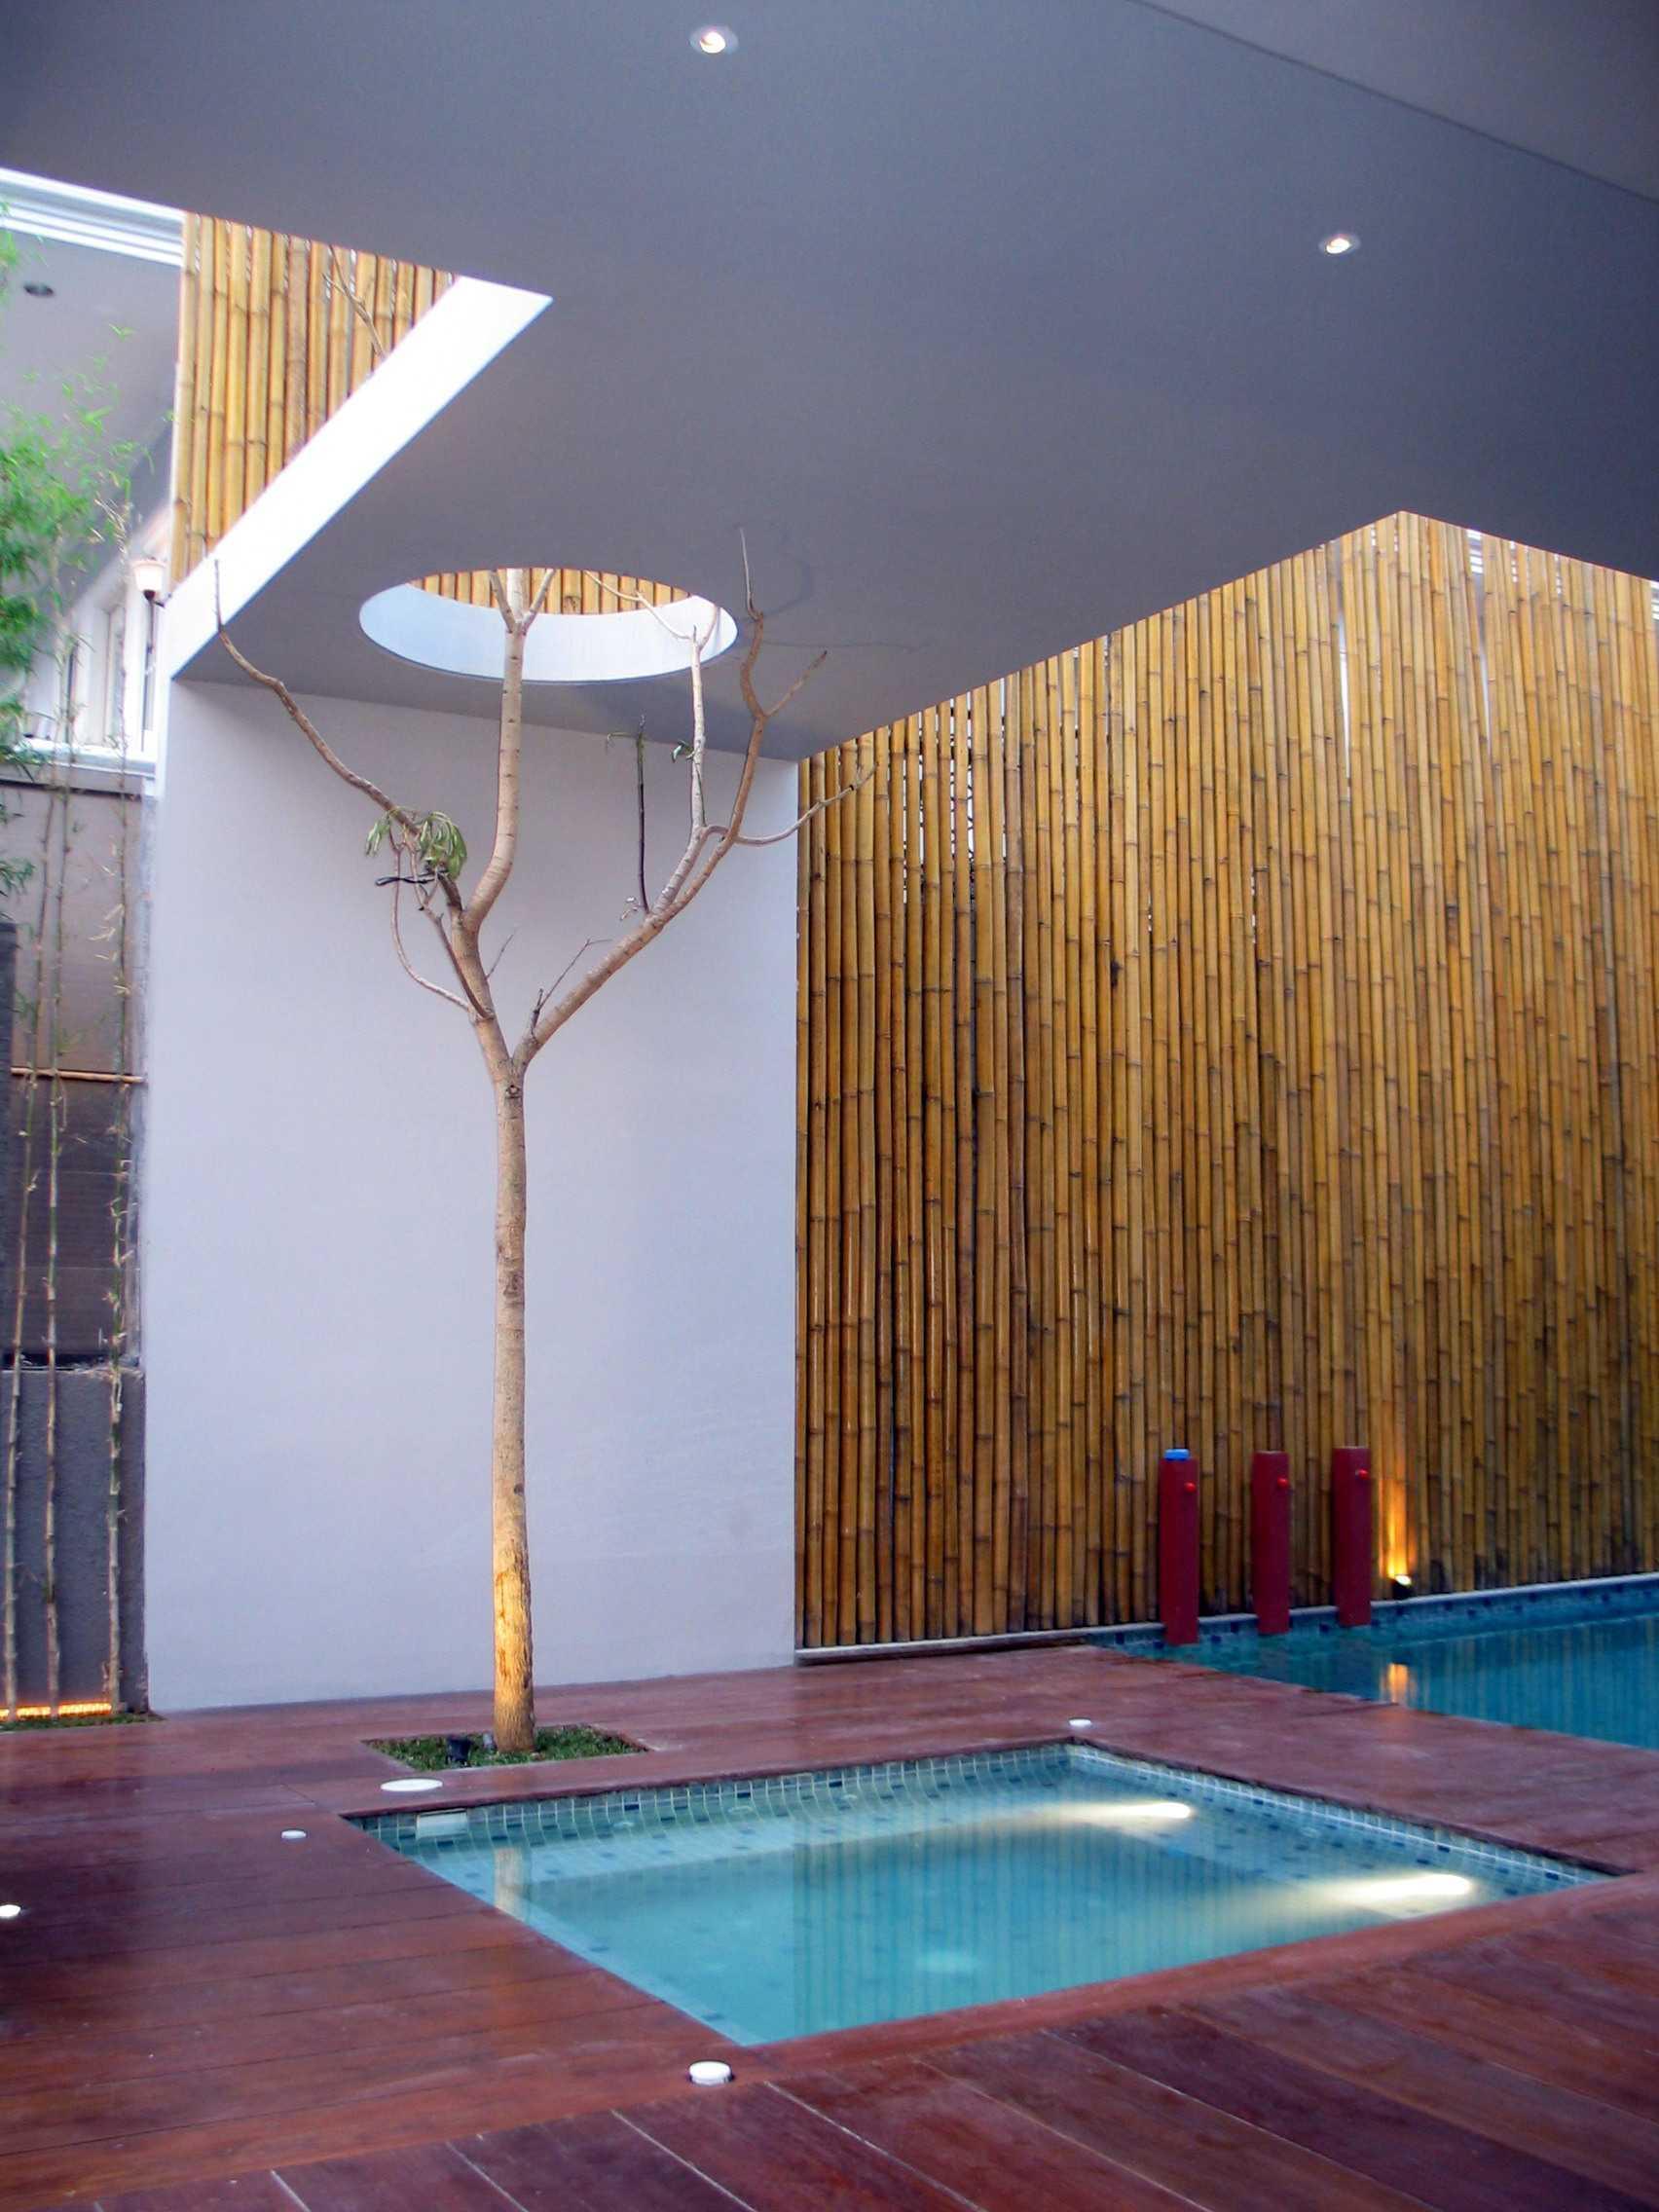 Herryj Architects Gv House Lippo Karawaci Lippo Karawaci Swimming Pool Tropis  23926